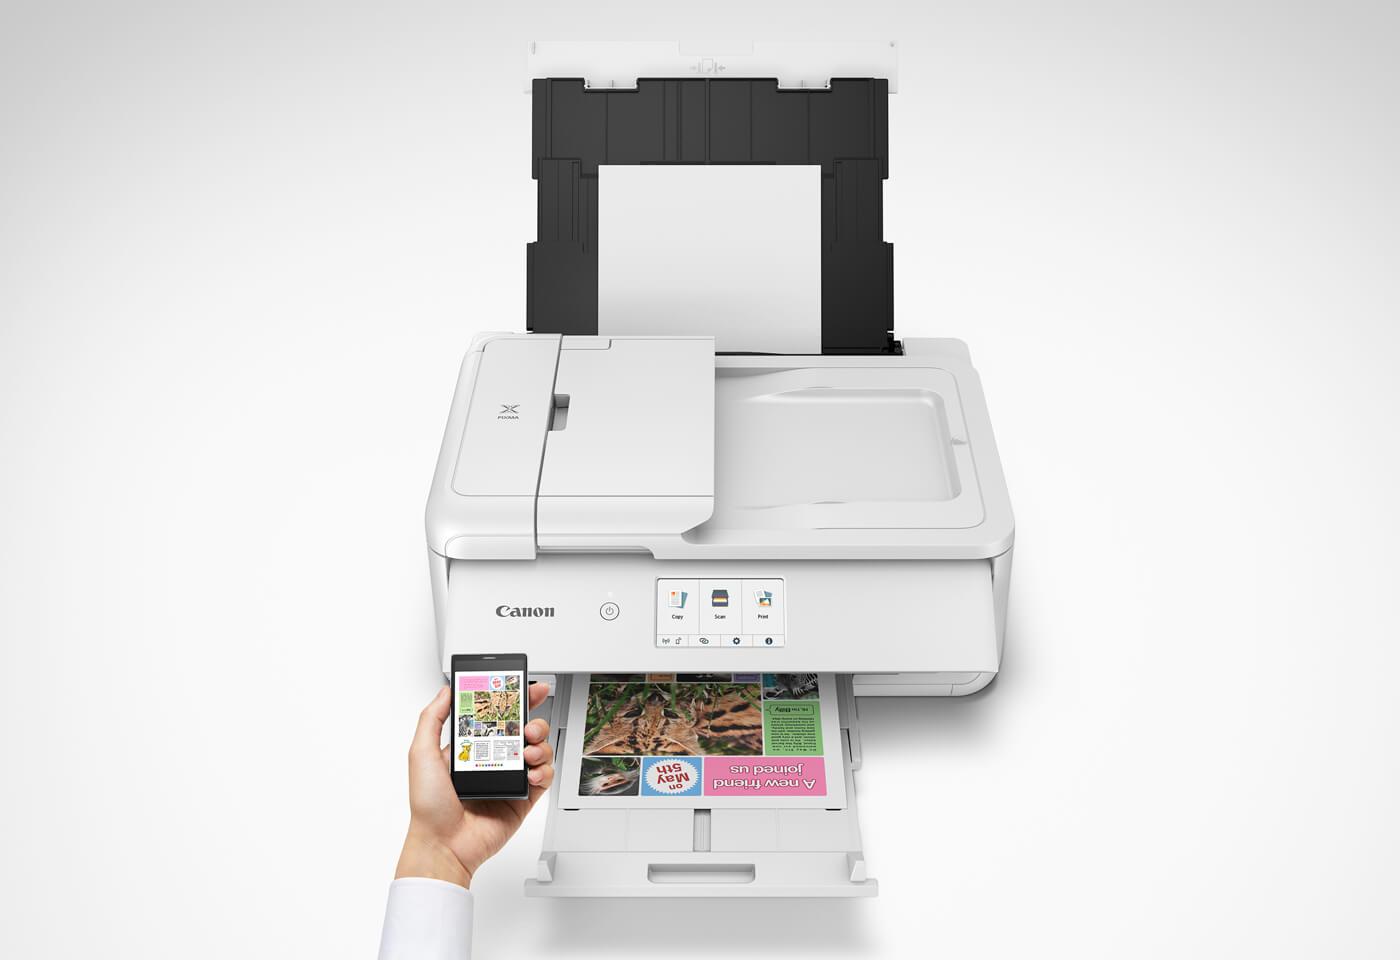 TS9565 Wireless printing